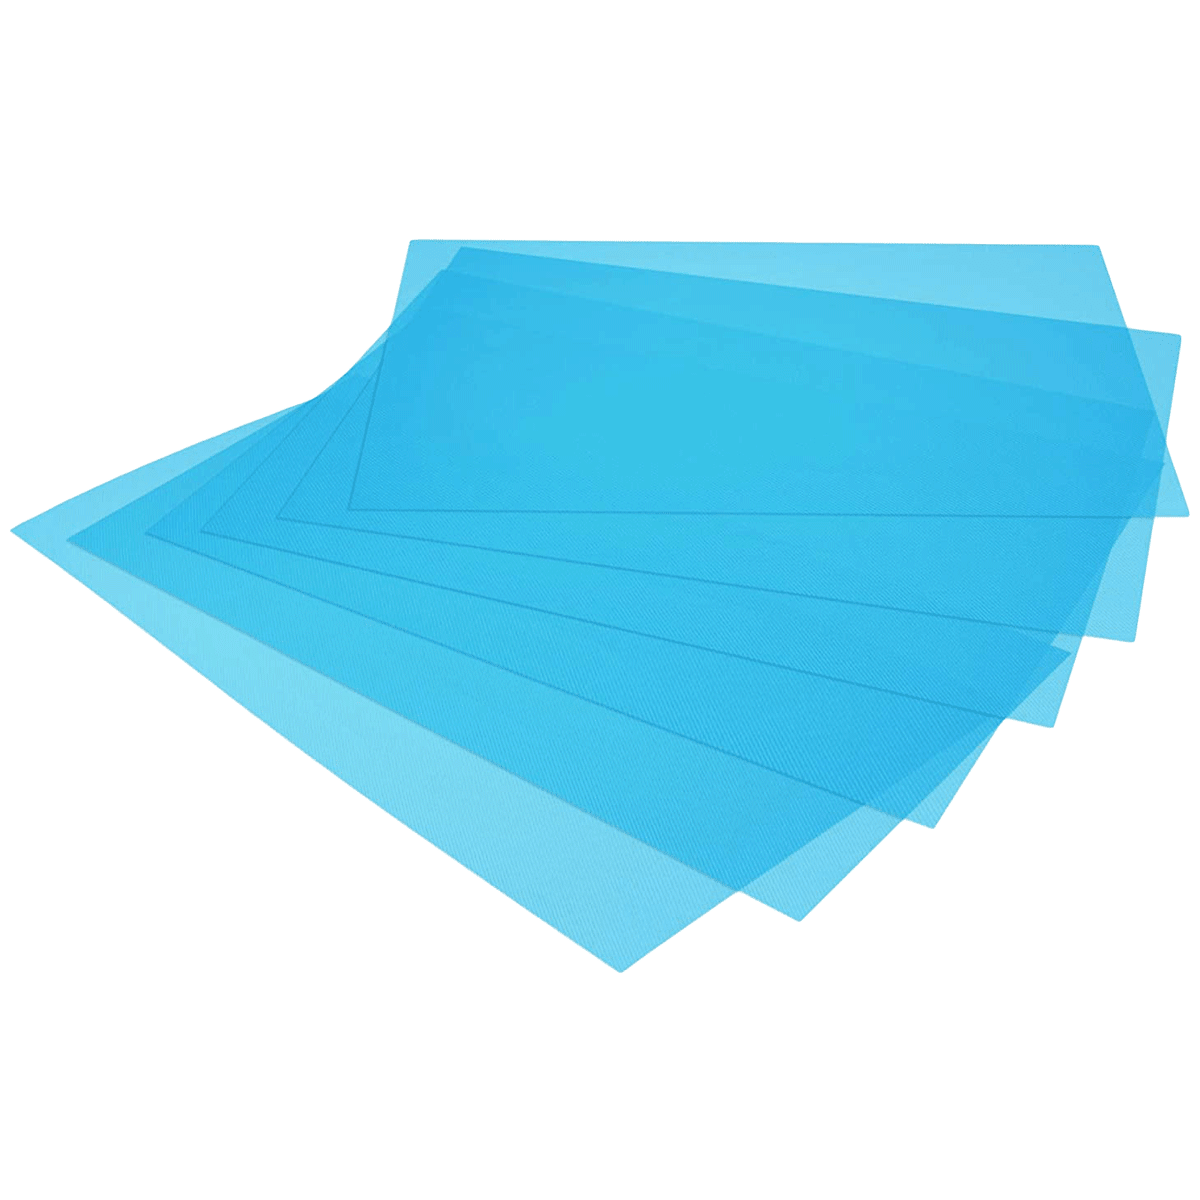 Kuber Industries Mat For Refrigerator (Multi-Purpose Mat, CTKTC032286, Blue)